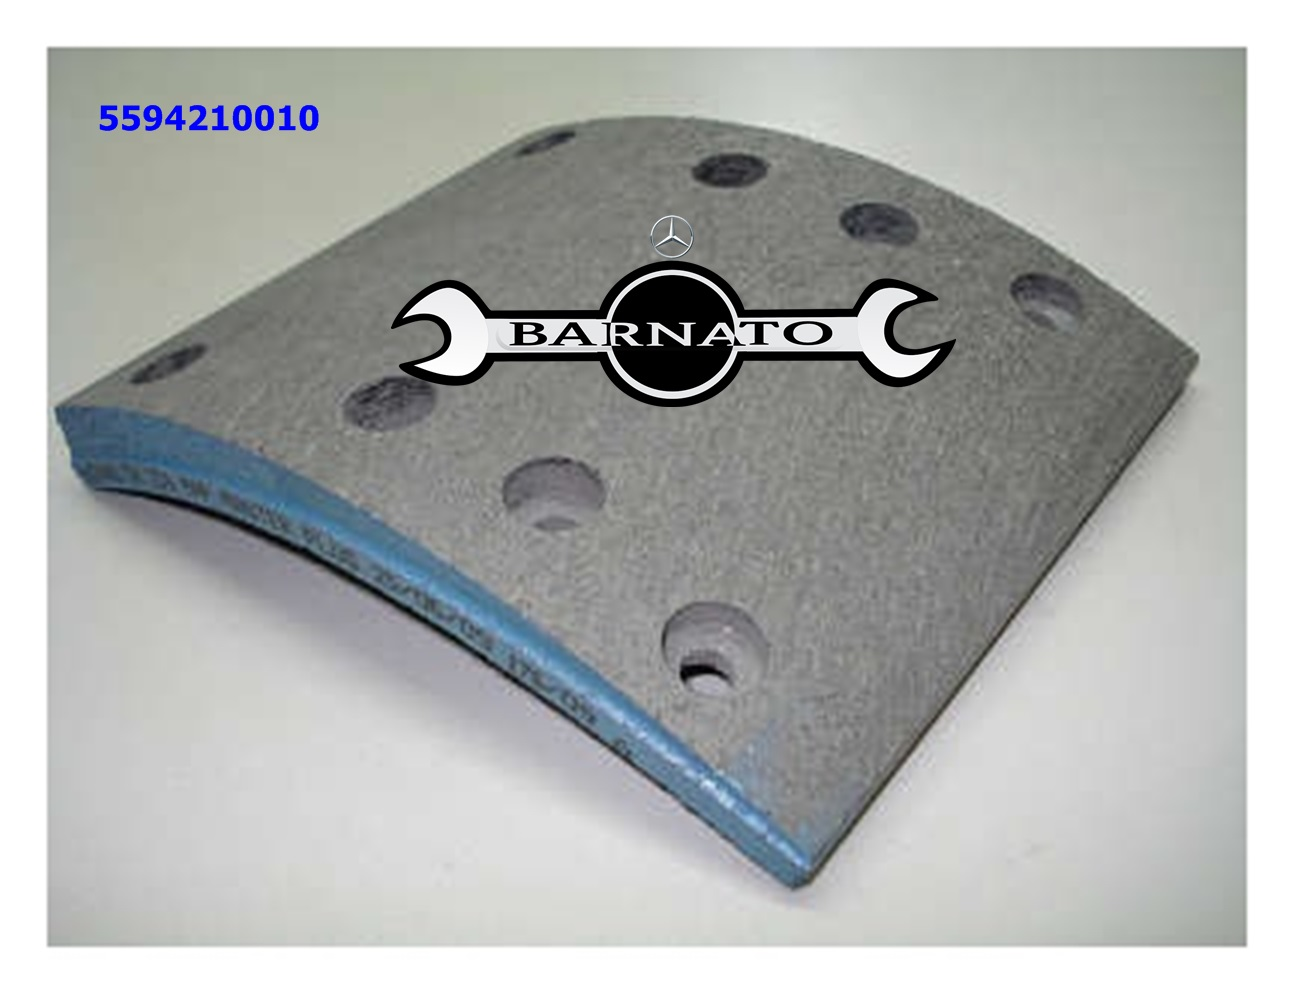 http://www.barnatoloja.com.br/produto.php?cod_produto=6428397